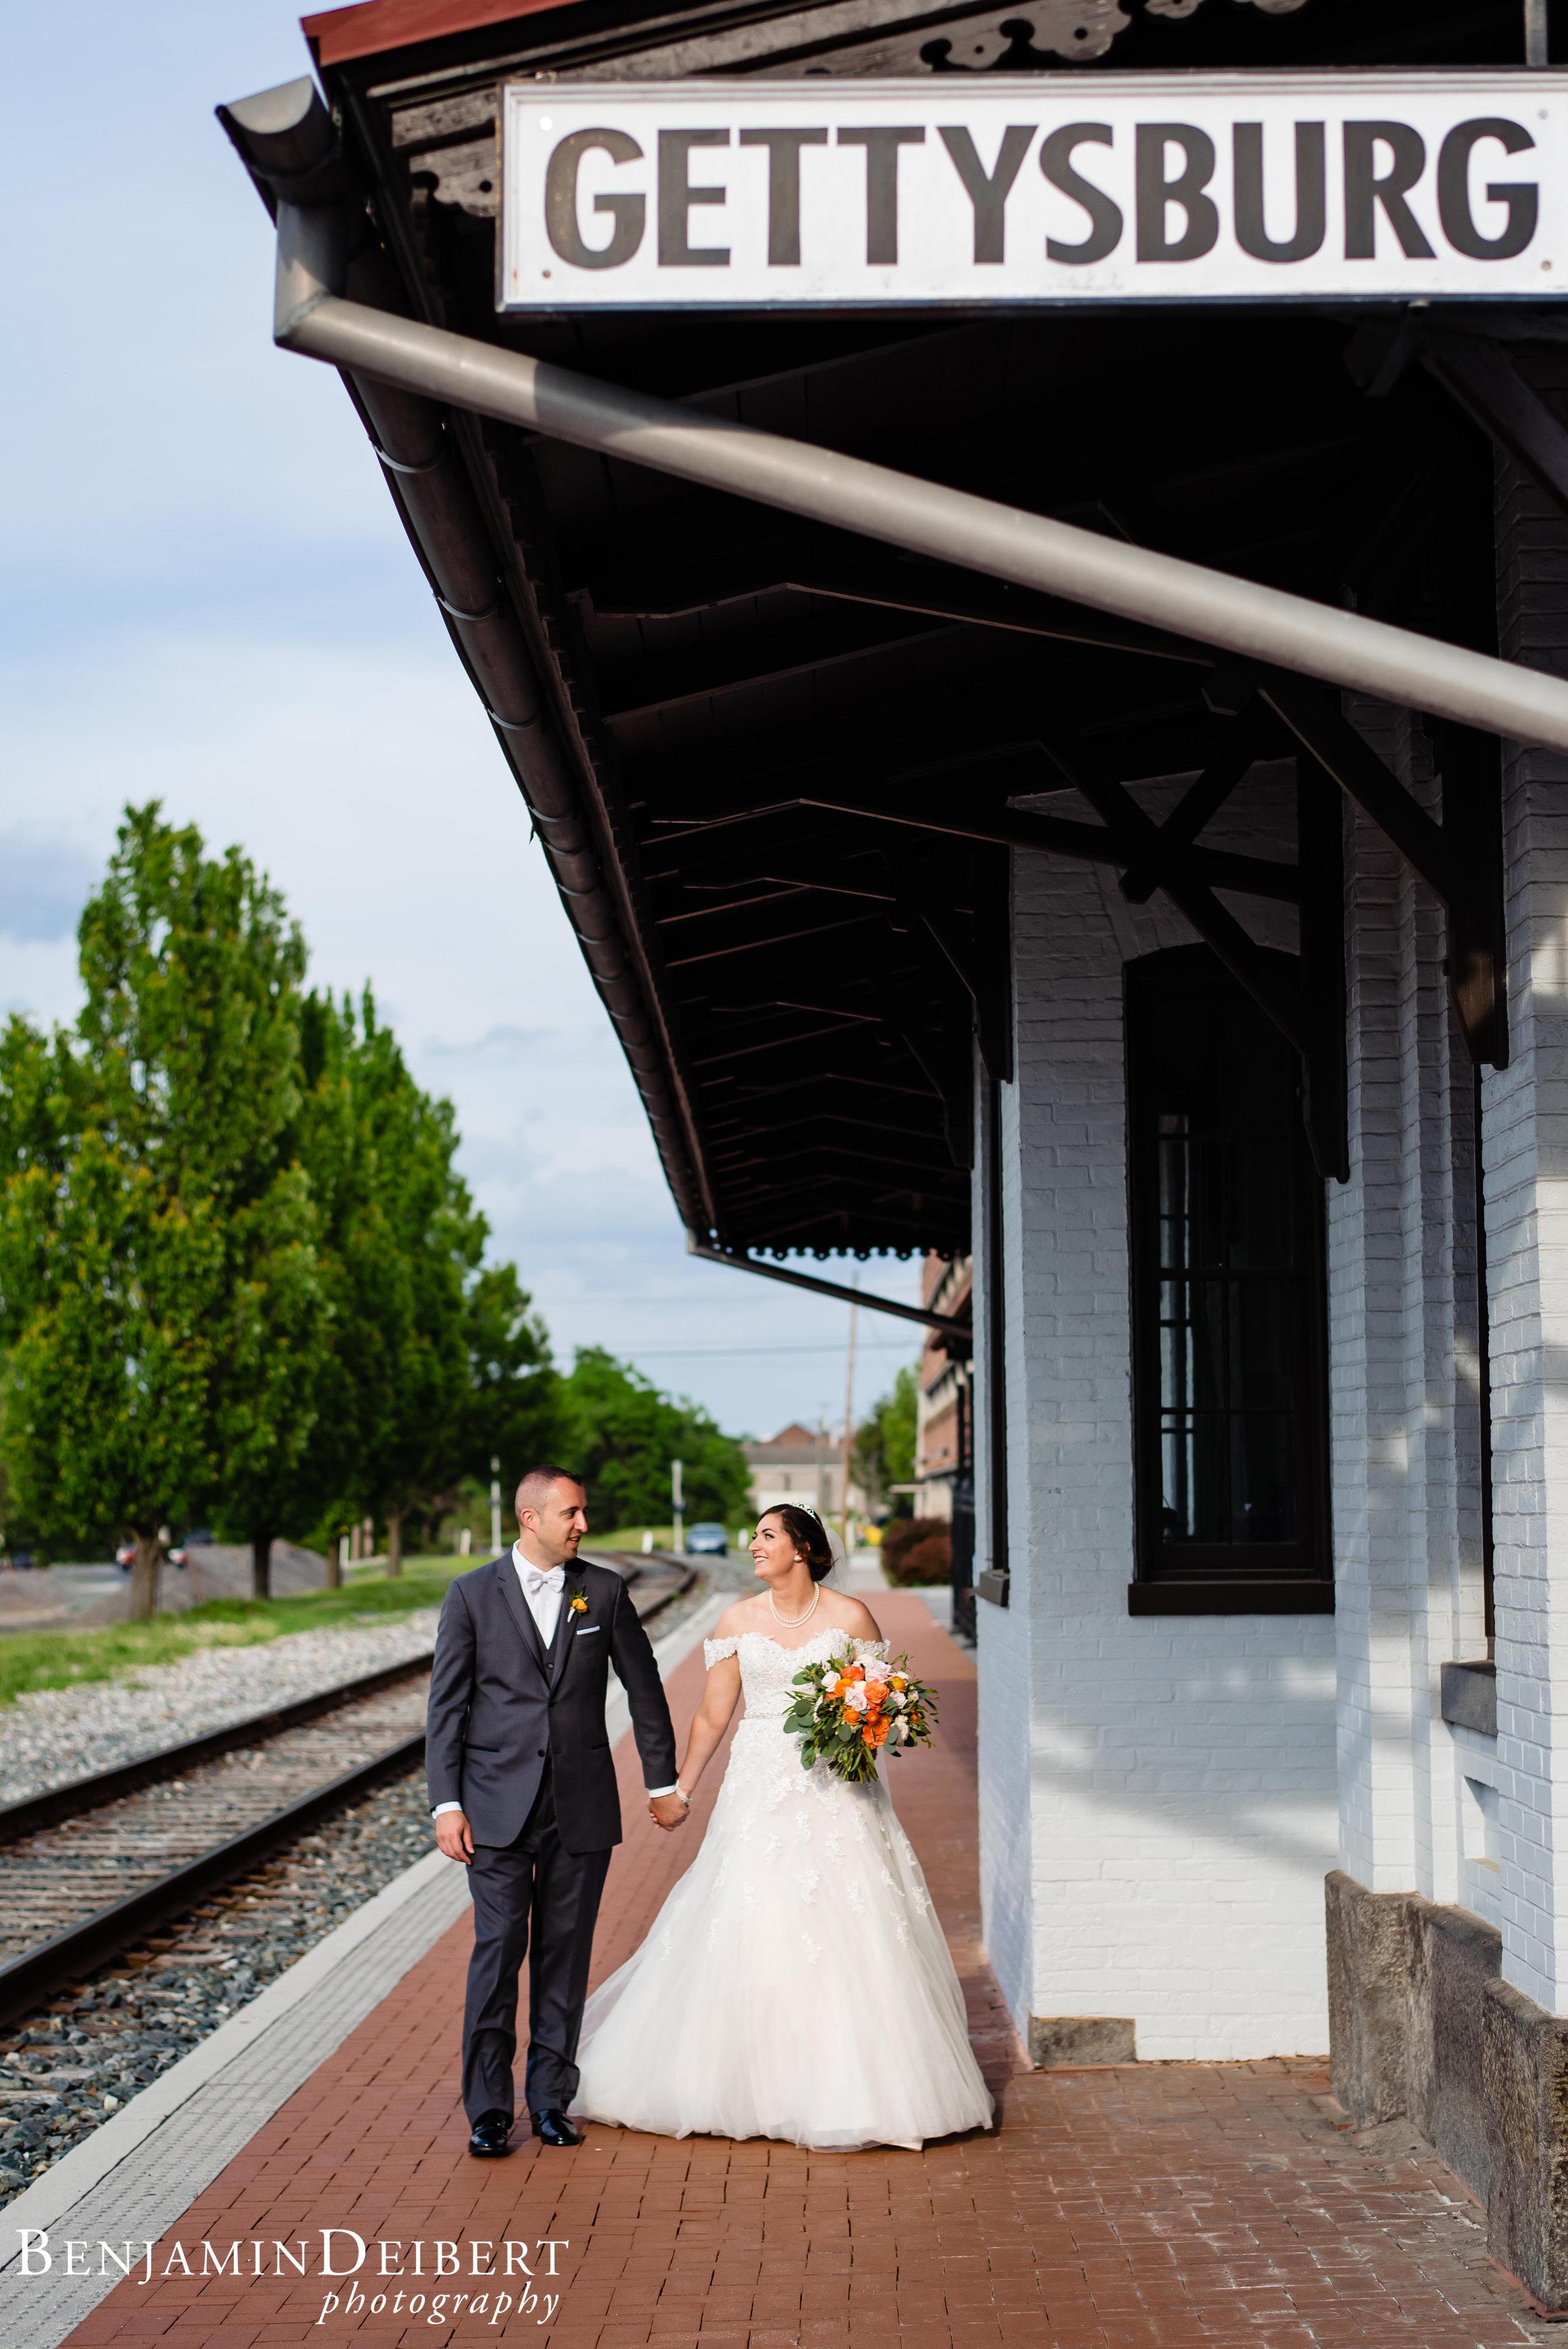 Meighan and Michael_Gettysburg Hotel Train Station_Wedding-16.jpg